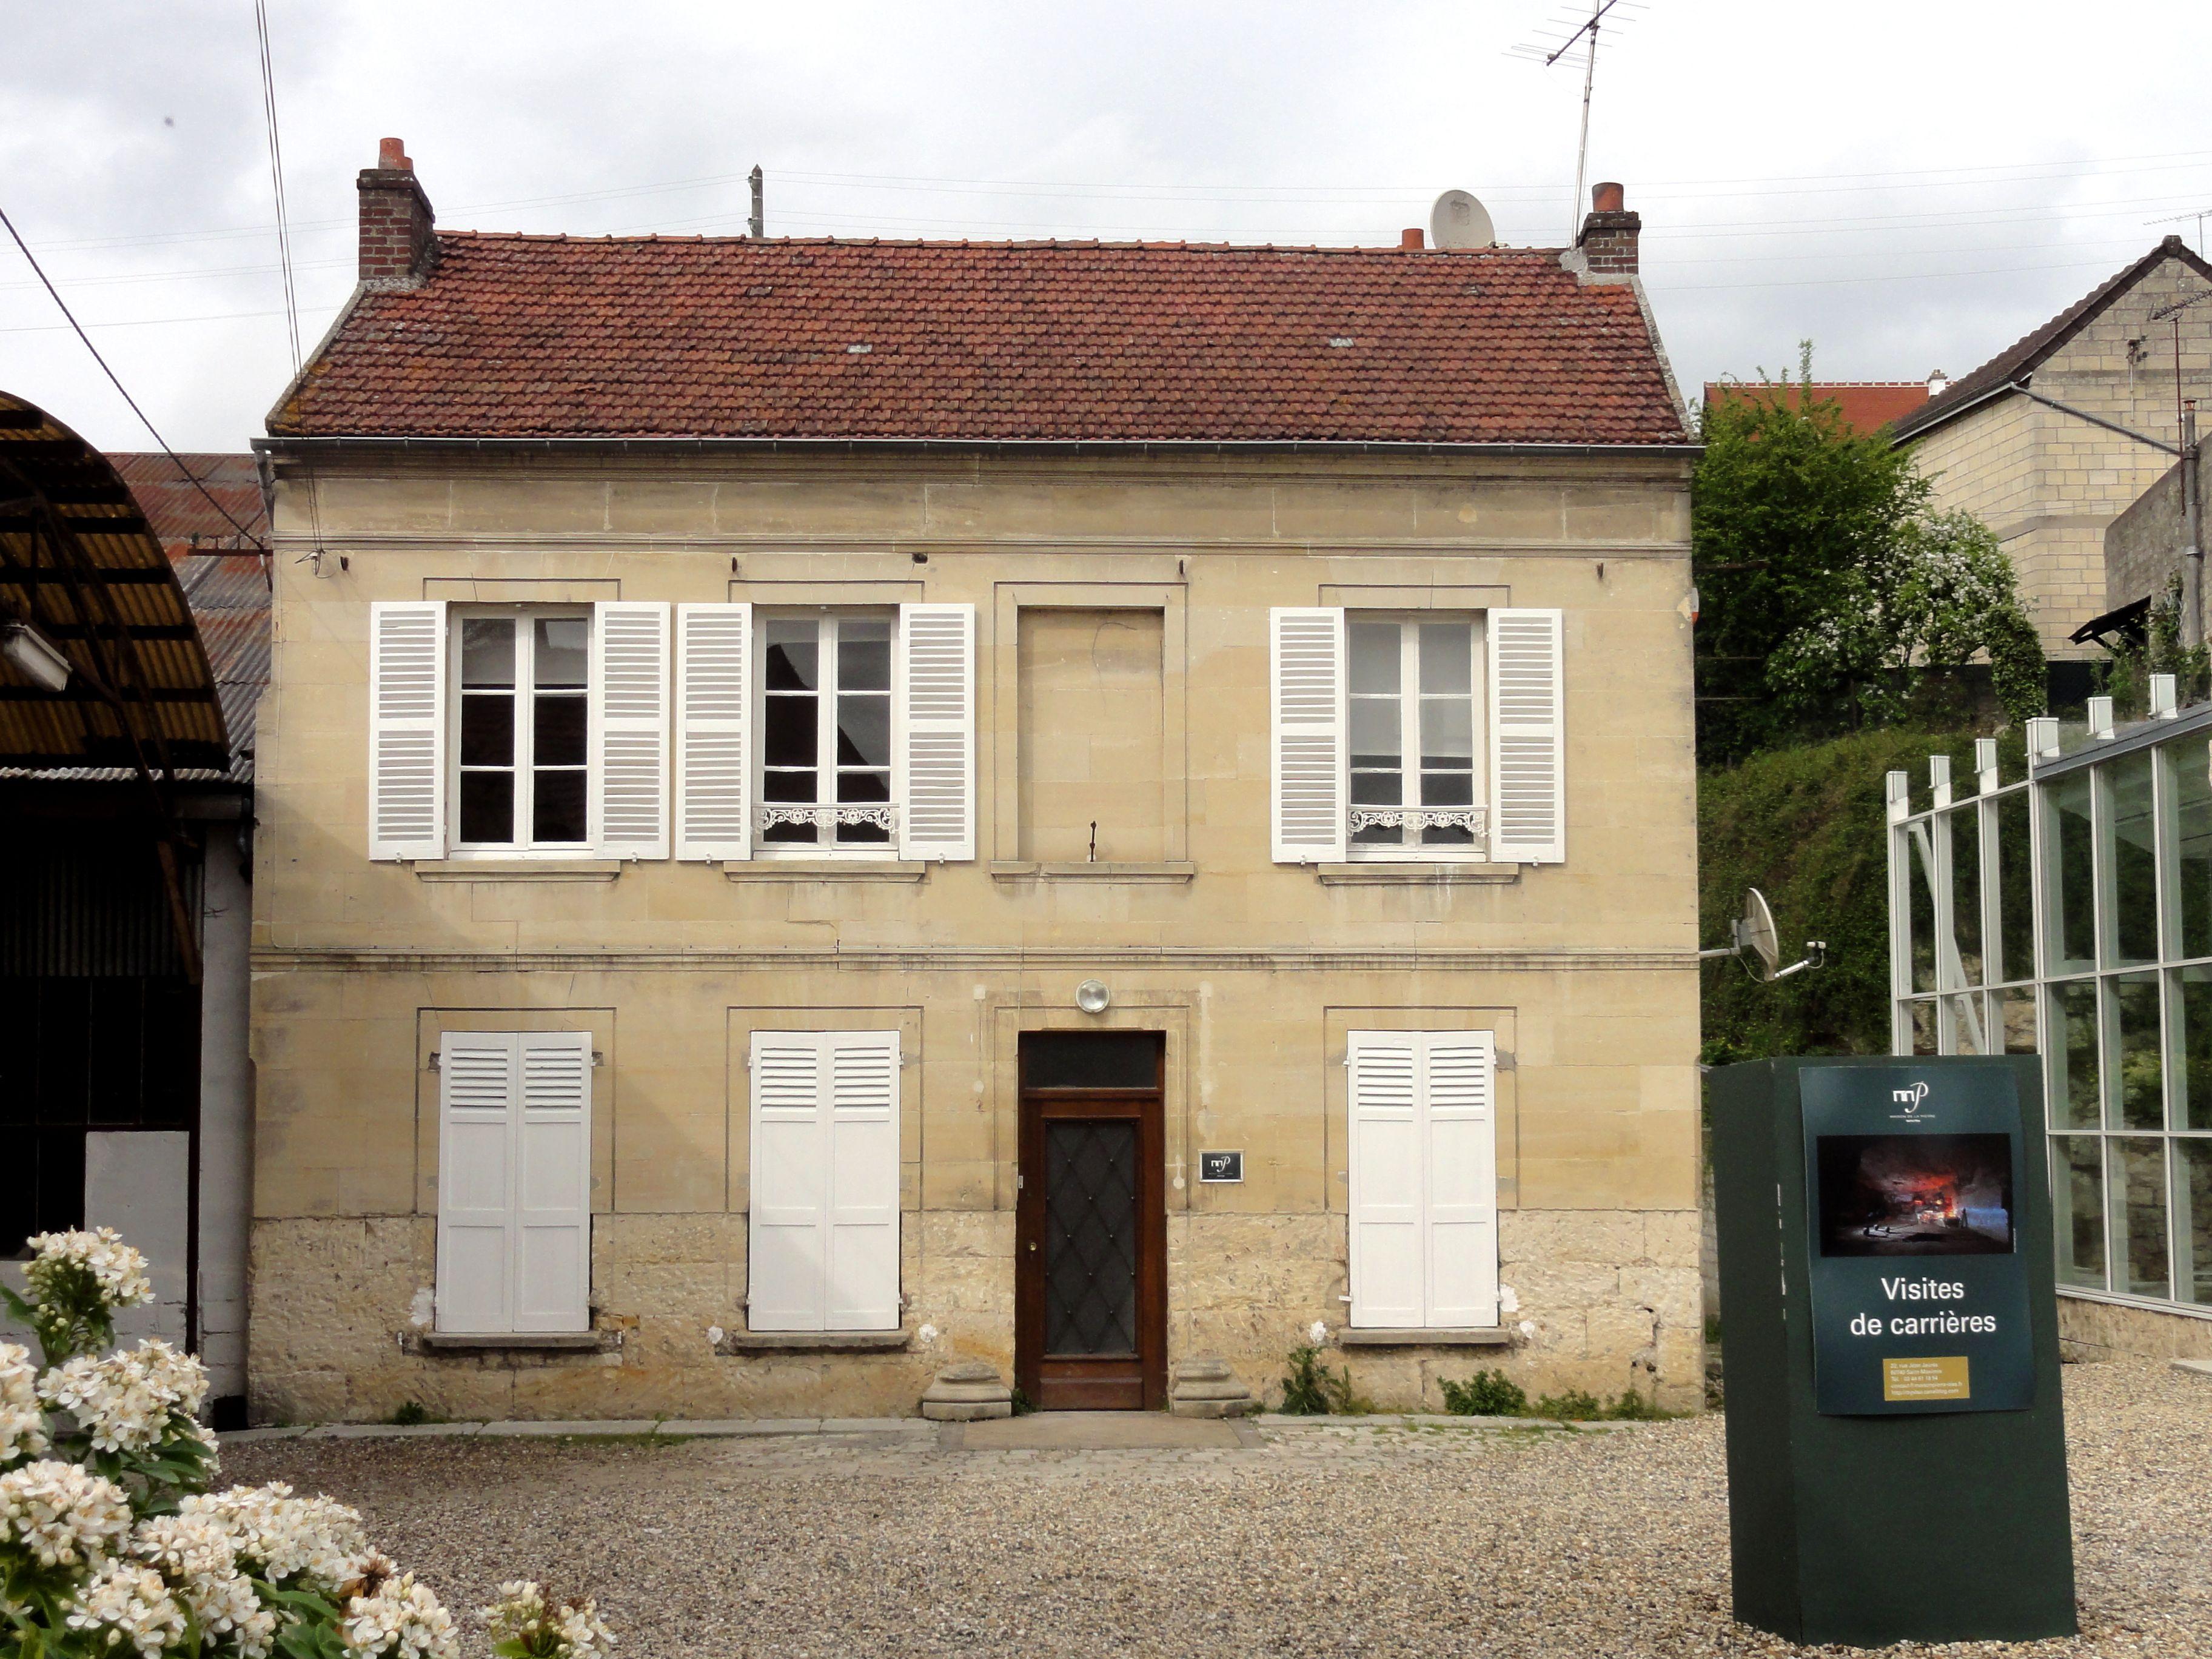 file:saint-maximin (60), maison de la pierre 3 - wikimedia commons